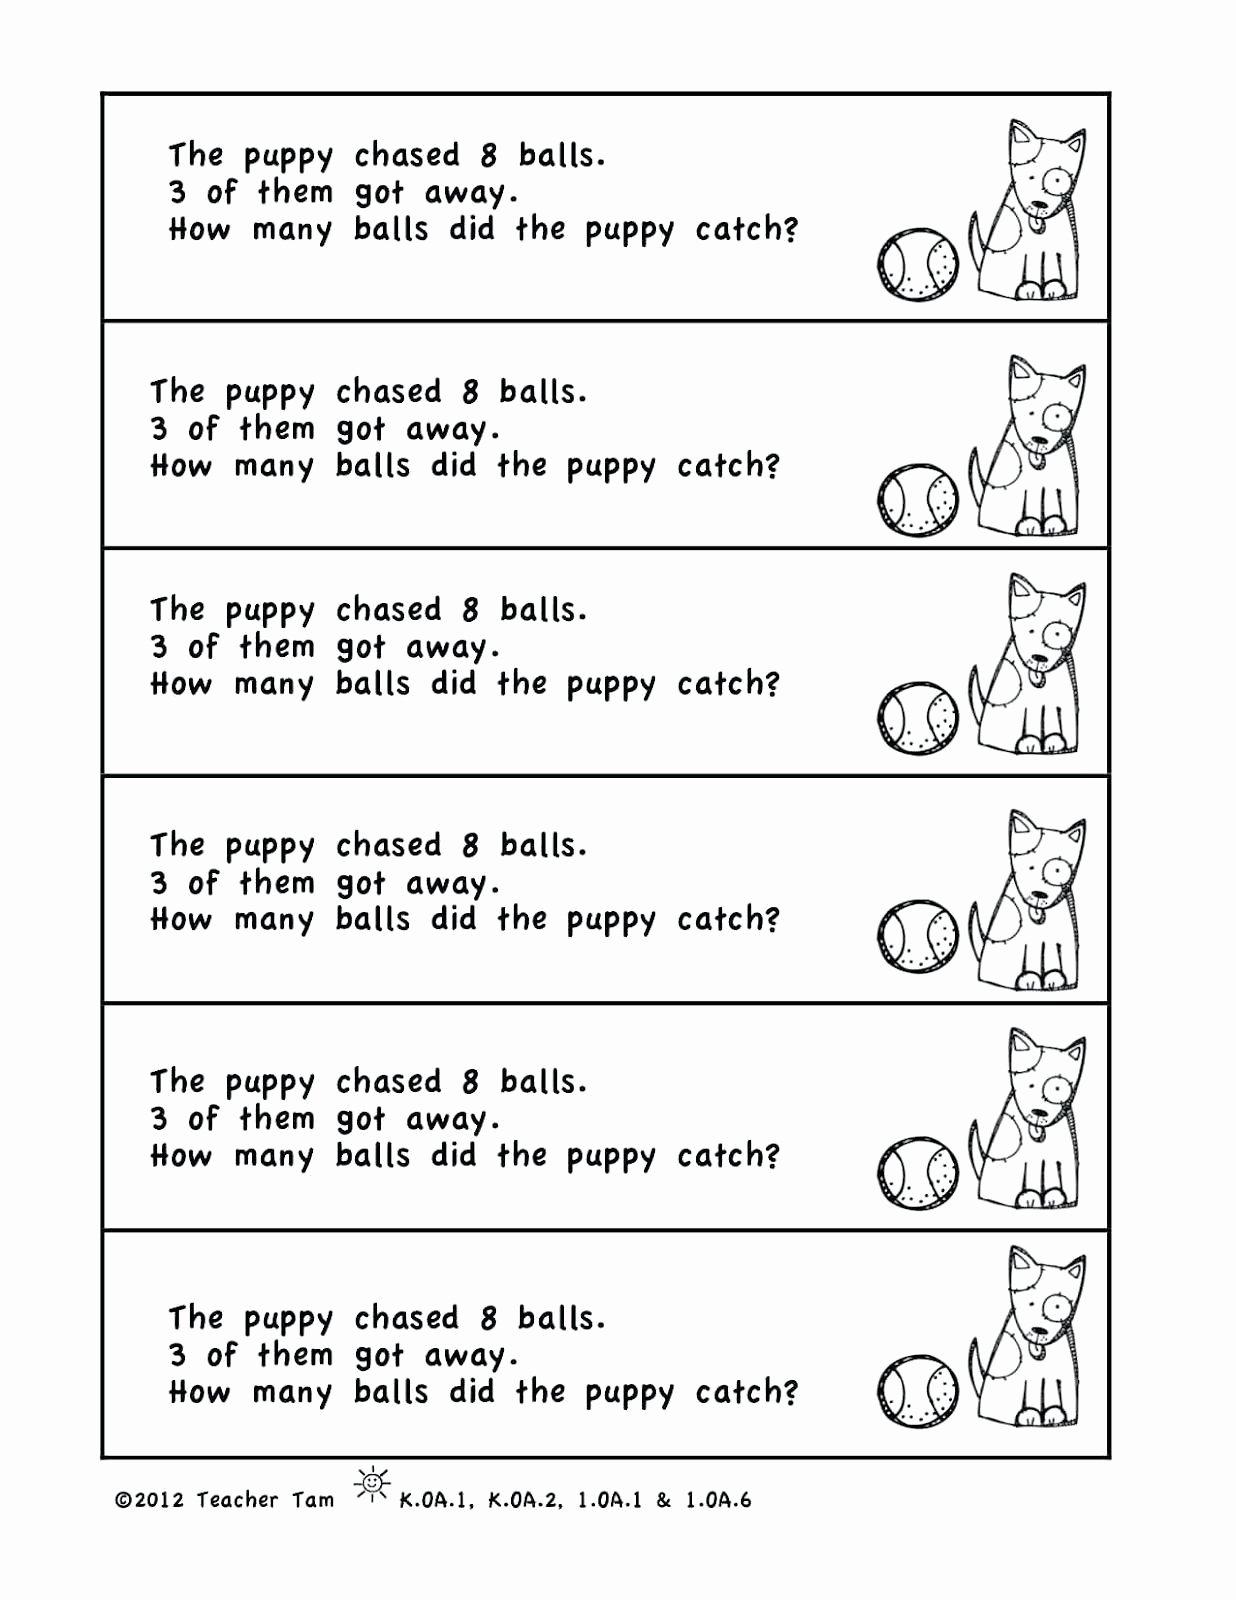 hight resolution of Problem solving Worksheets for Preschoolers Awesome Abandonment Worksheet  Printable Worksheets and Activities – Printable Worksheets for Kids